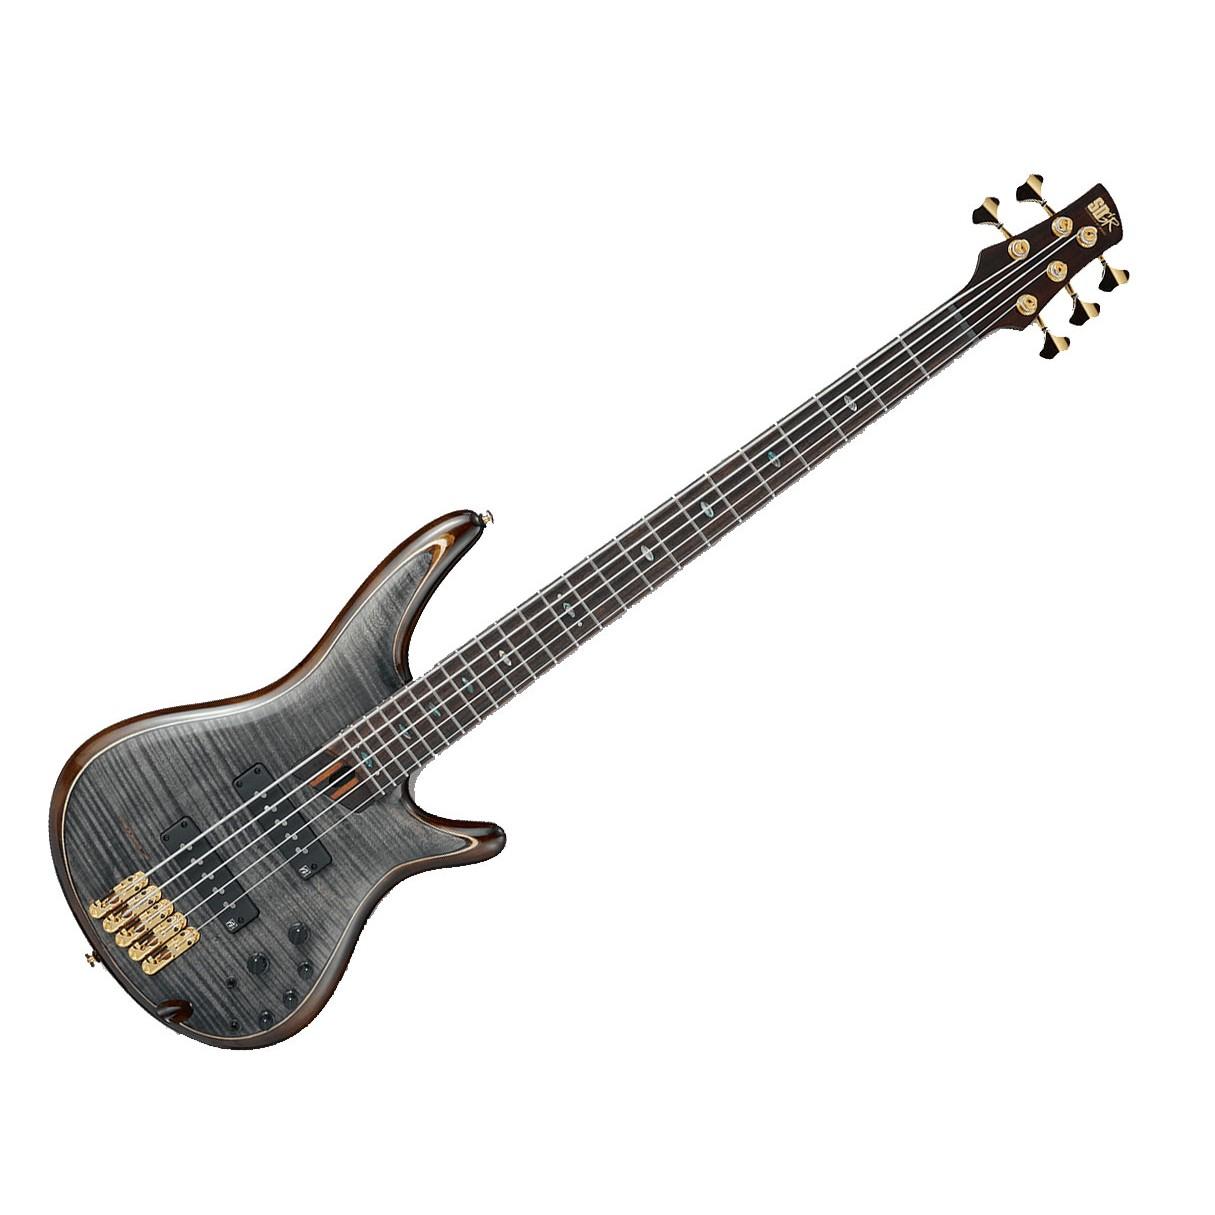 ibanez sr1405e 5 string premium electric bass trans gray black. Black Bedroom Furniture Sets. Home Design Ideas